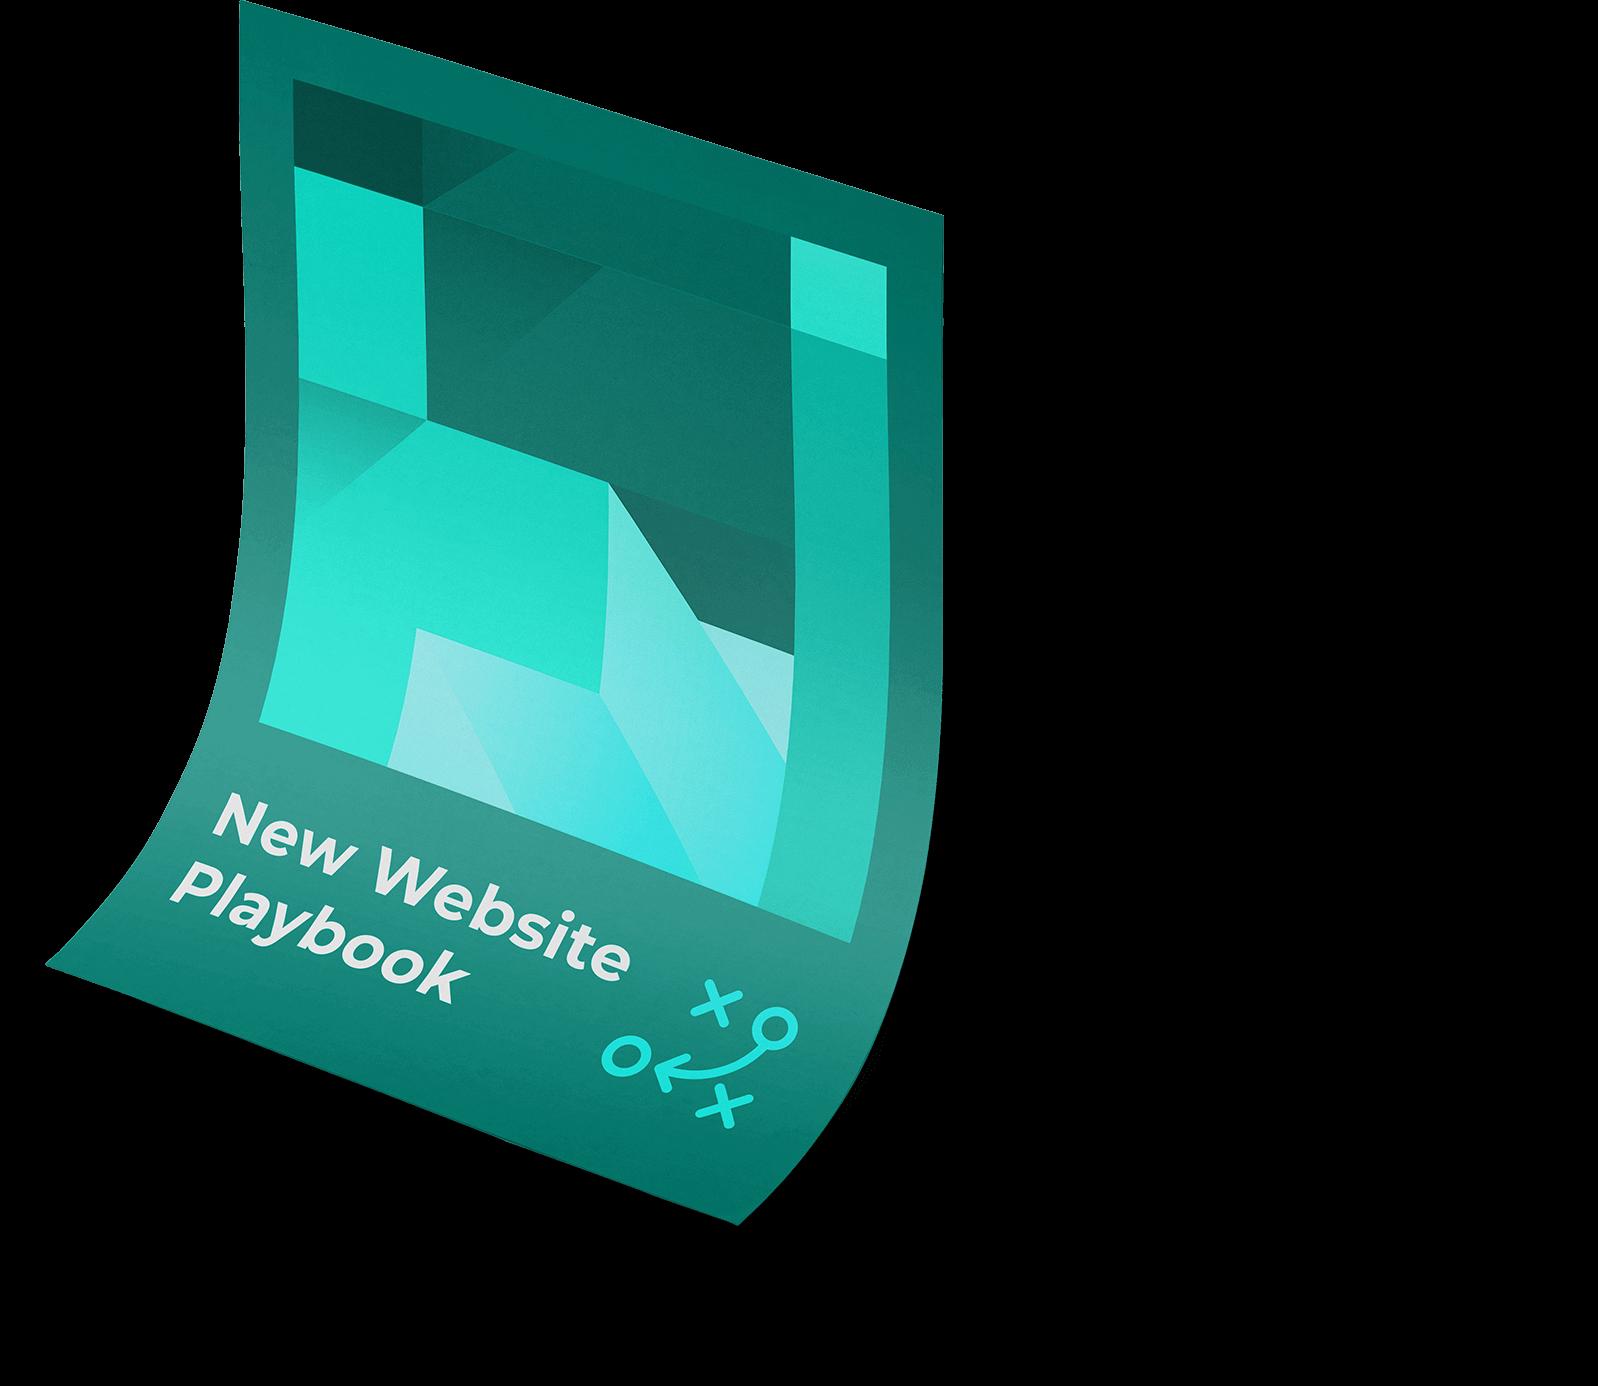 website playbook